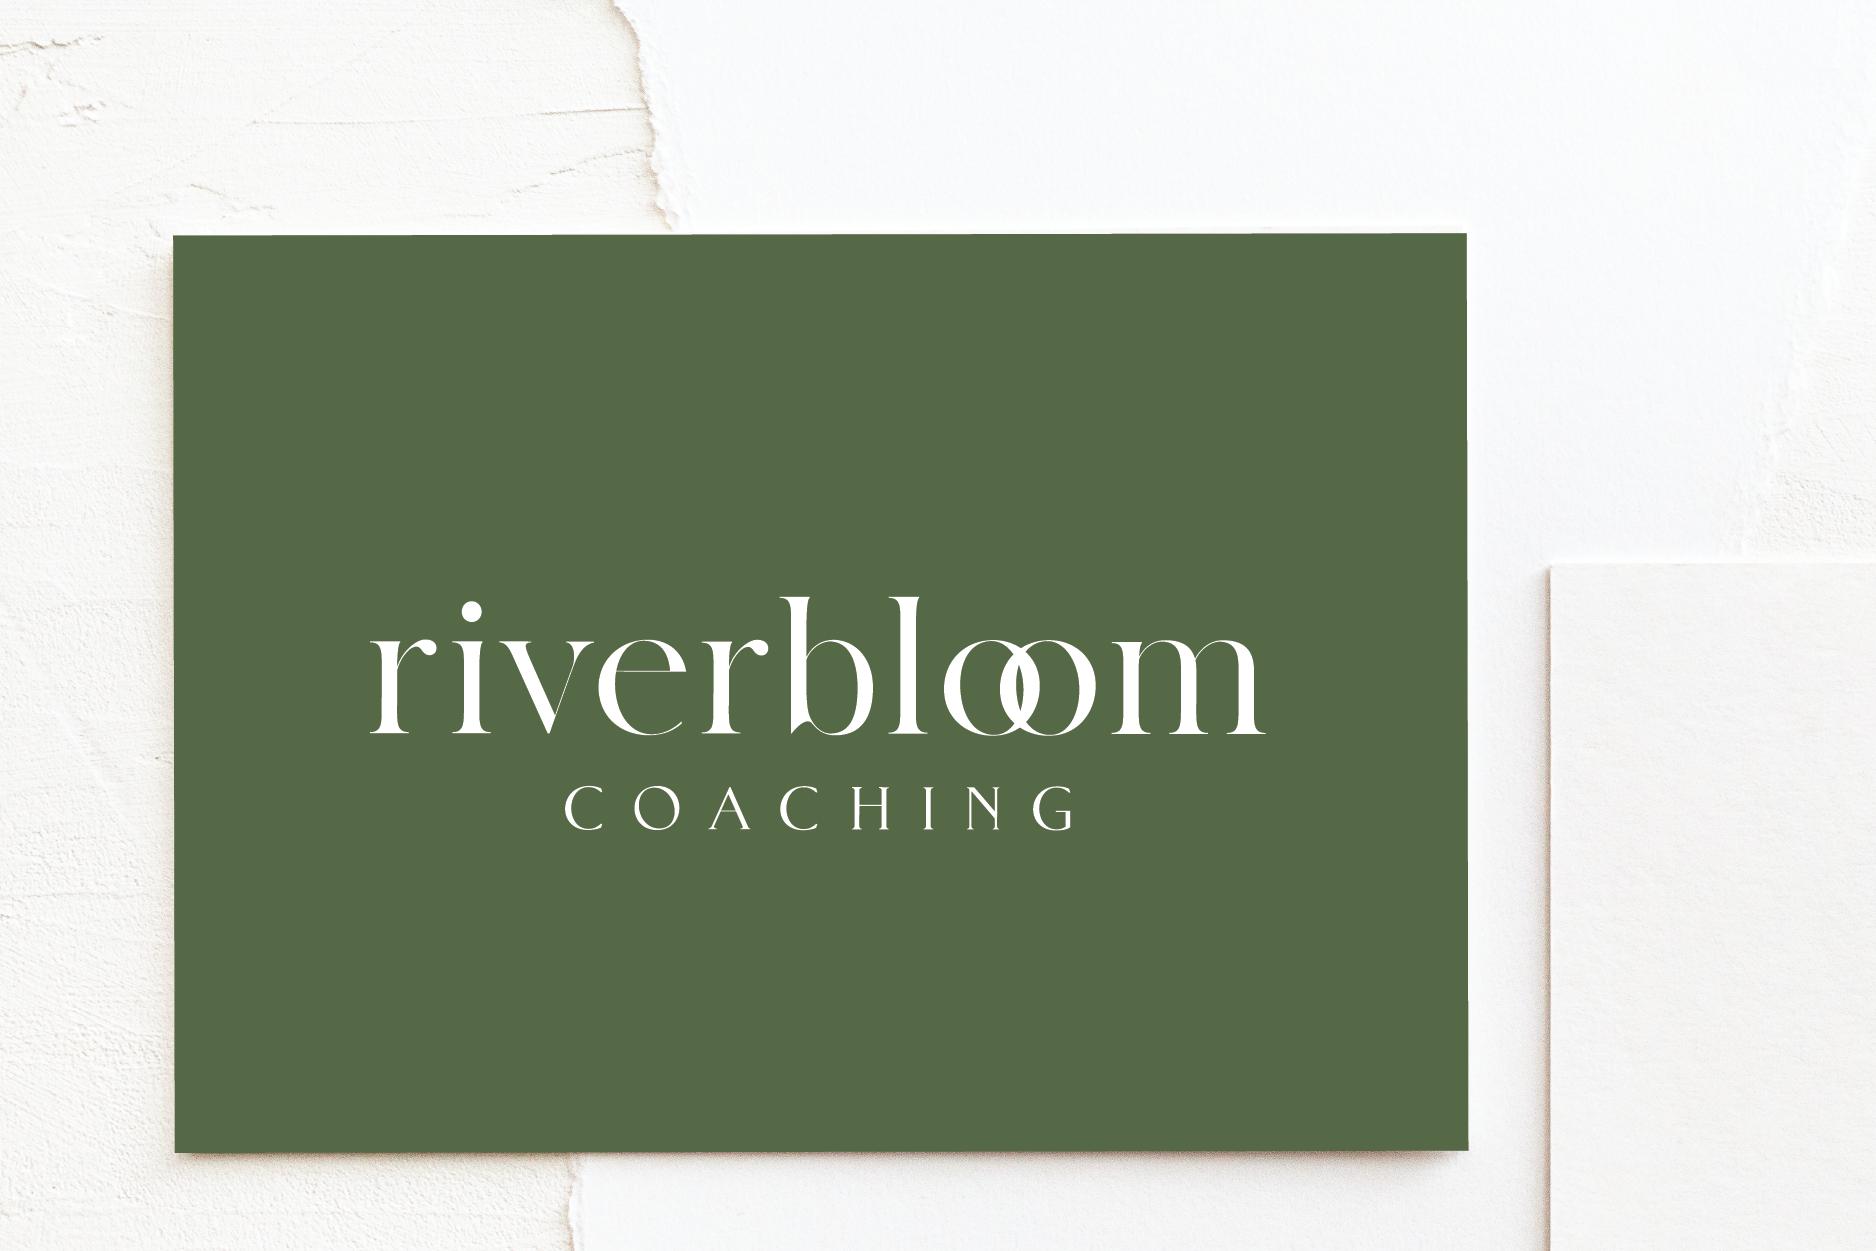 Riverbloom Coaching Branding | Brand Identity Design by Fresh Leaf Creative